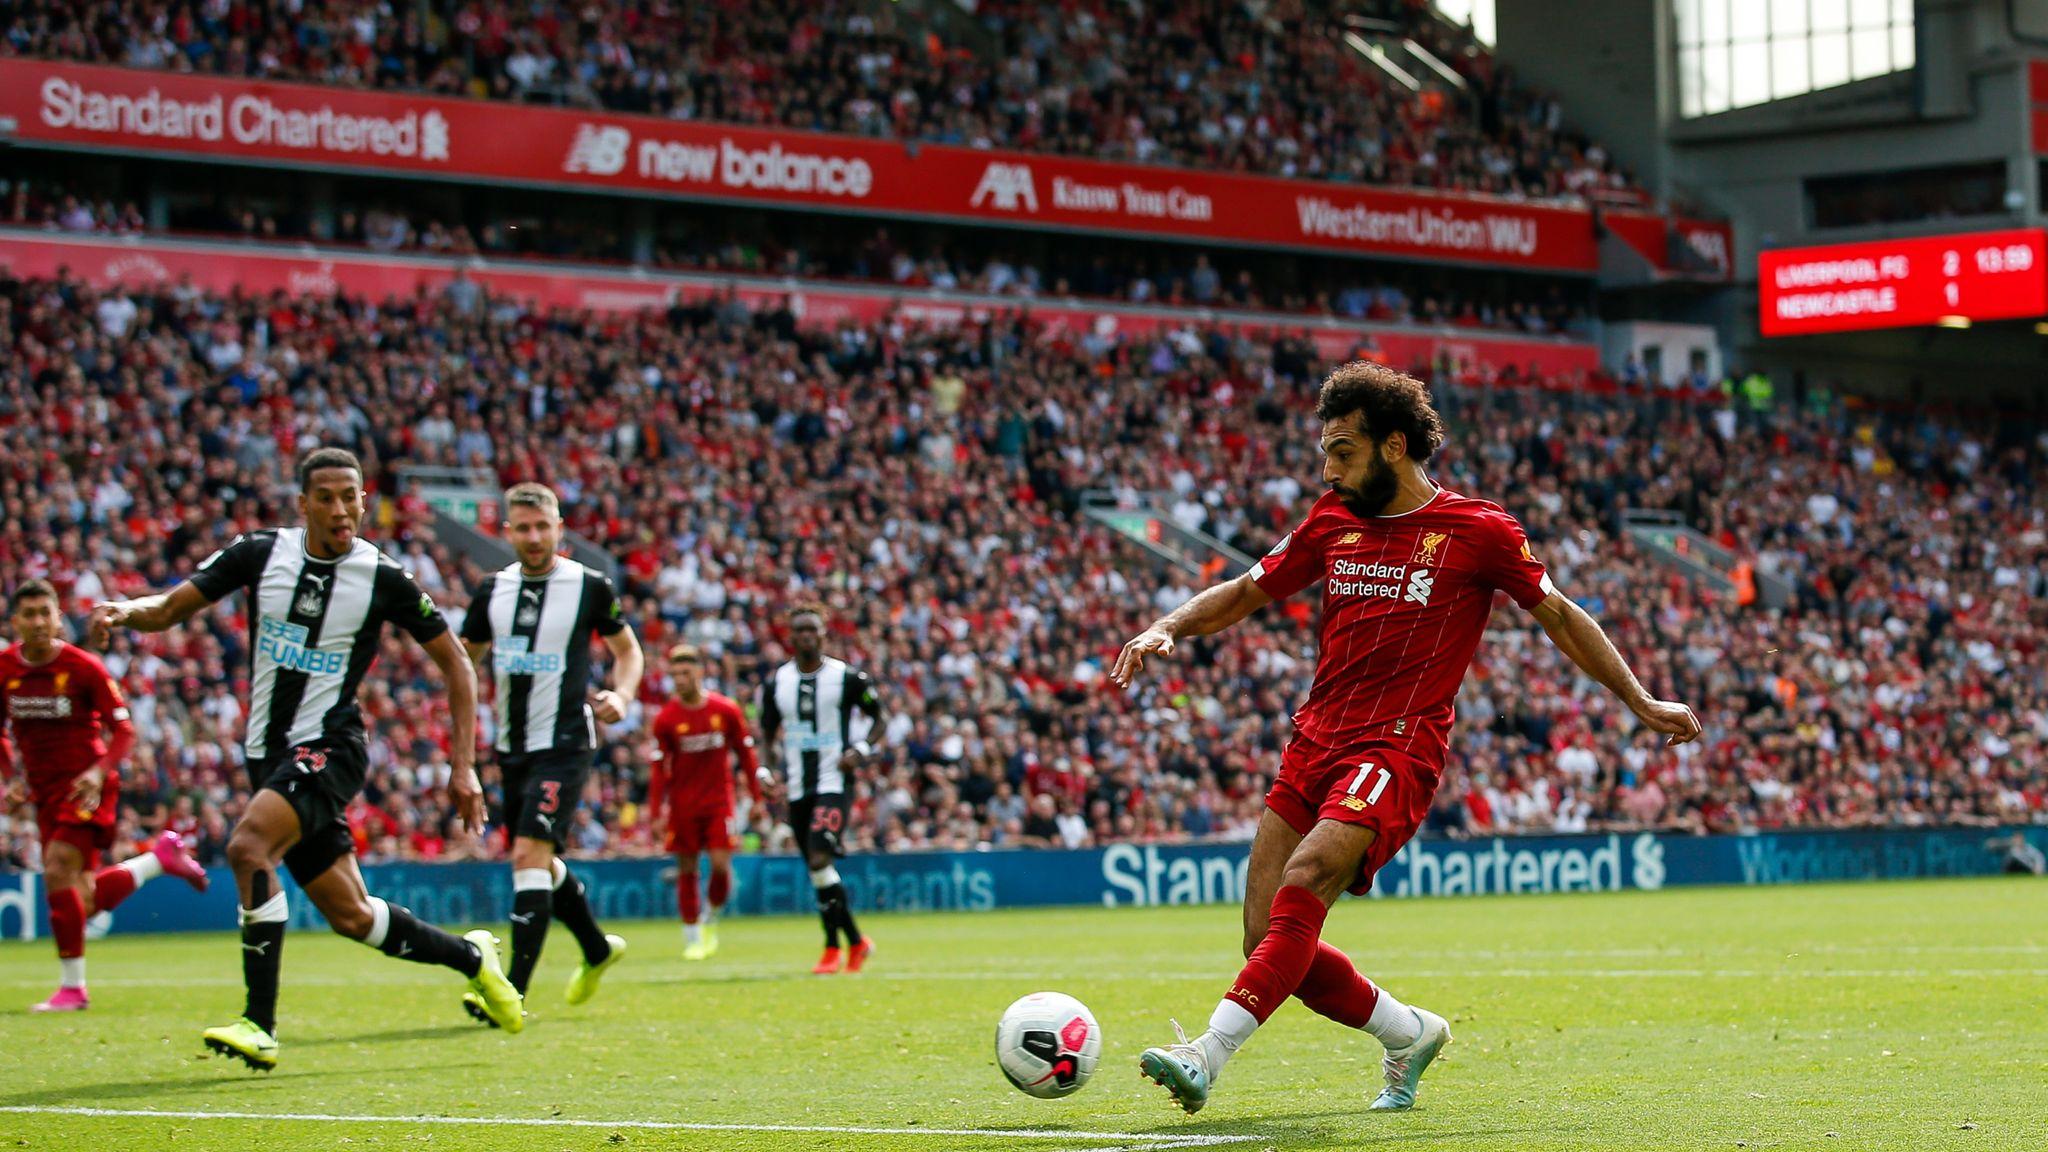 Mohamed Salah, Kevin De Bruyne - Pick your Premier League goal of the month for September